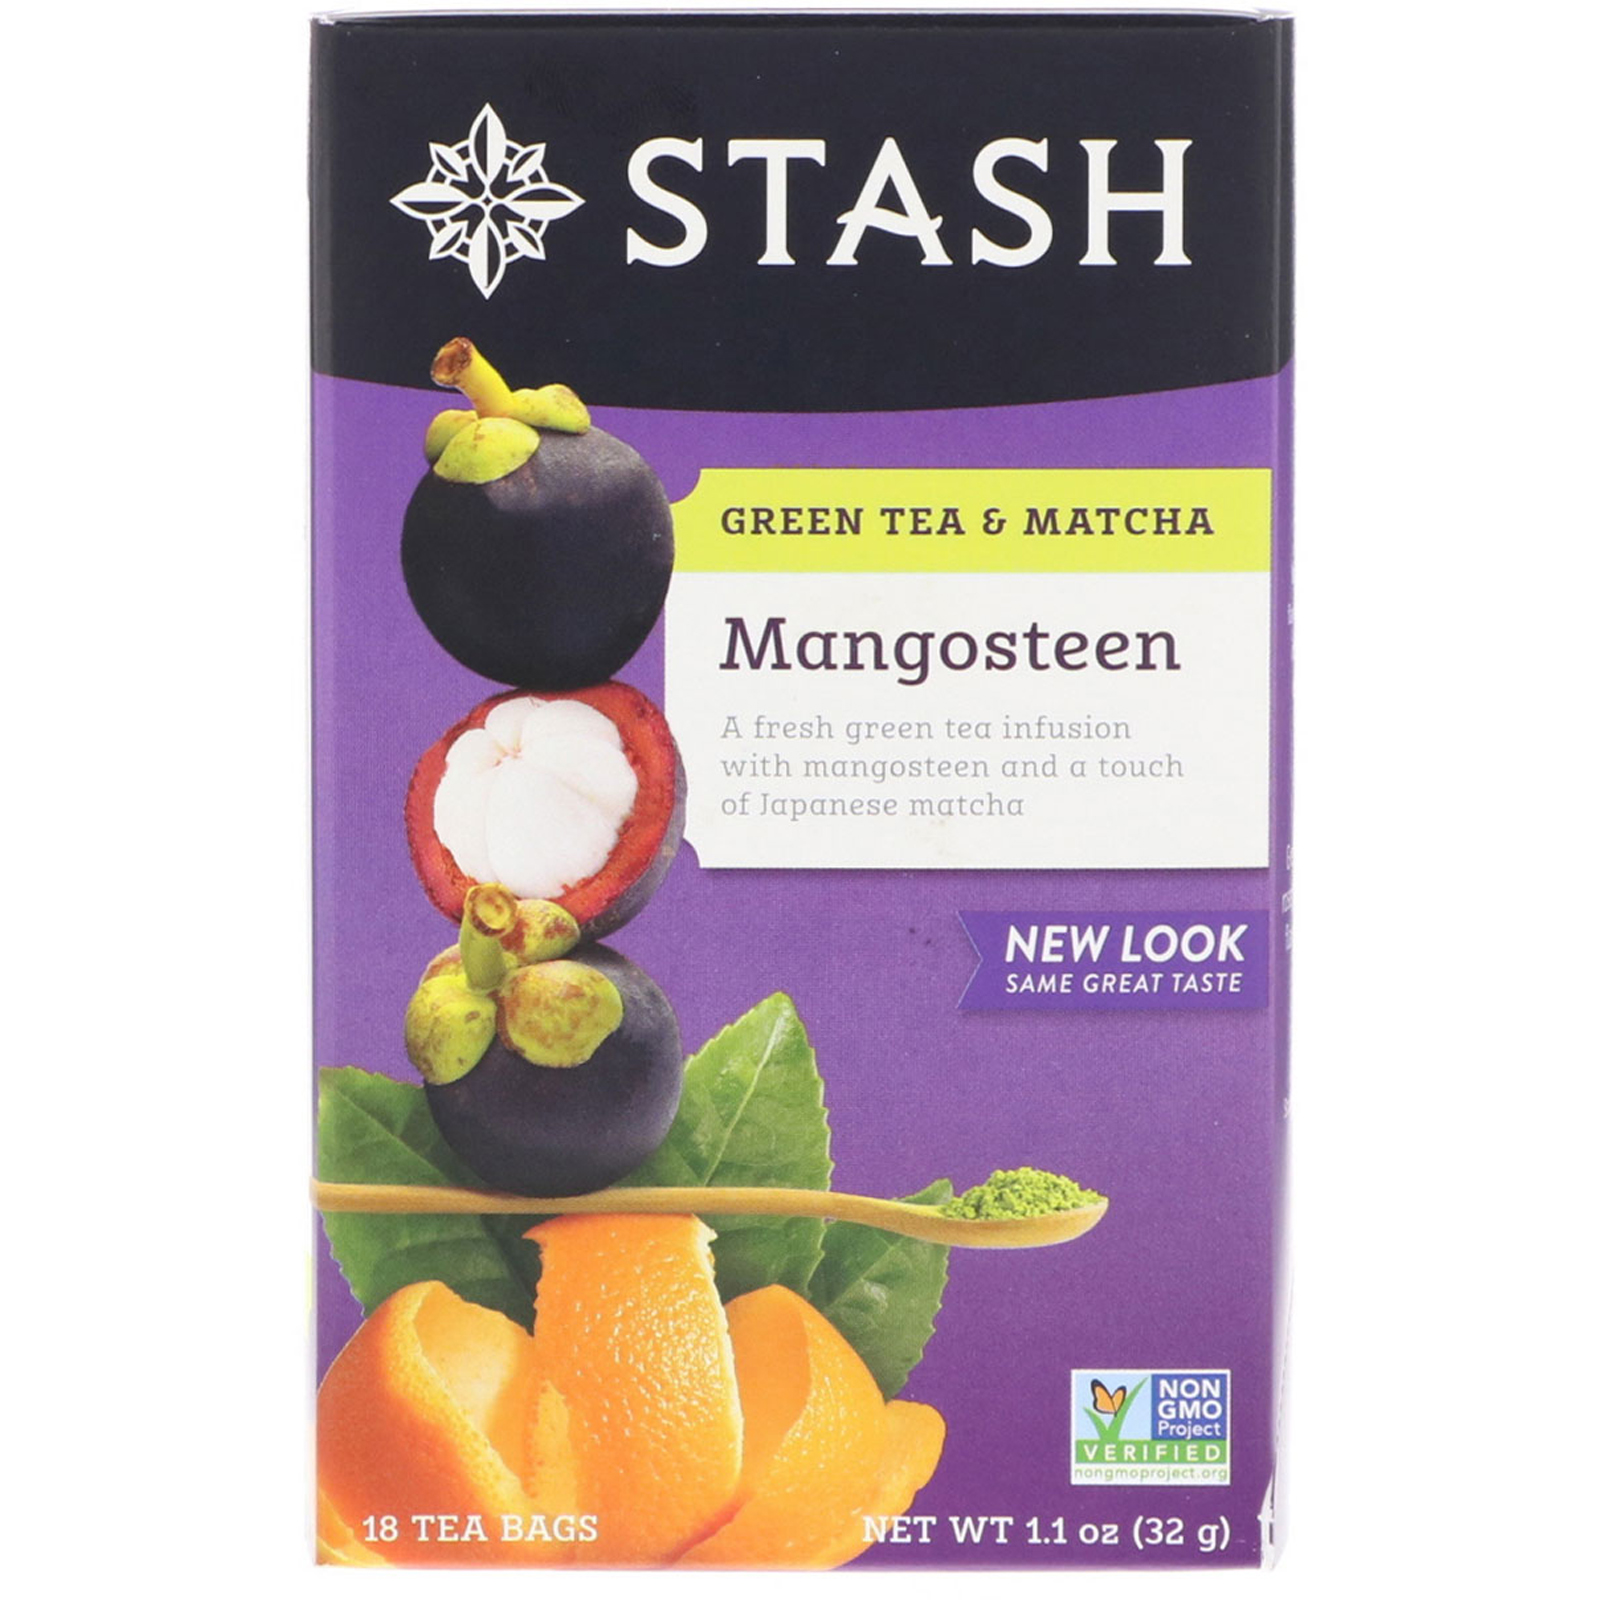 Stash Tea, Green Tea & Matcha, Mangosteen, 18 Tea Bags, 1 1 oz (32 g)